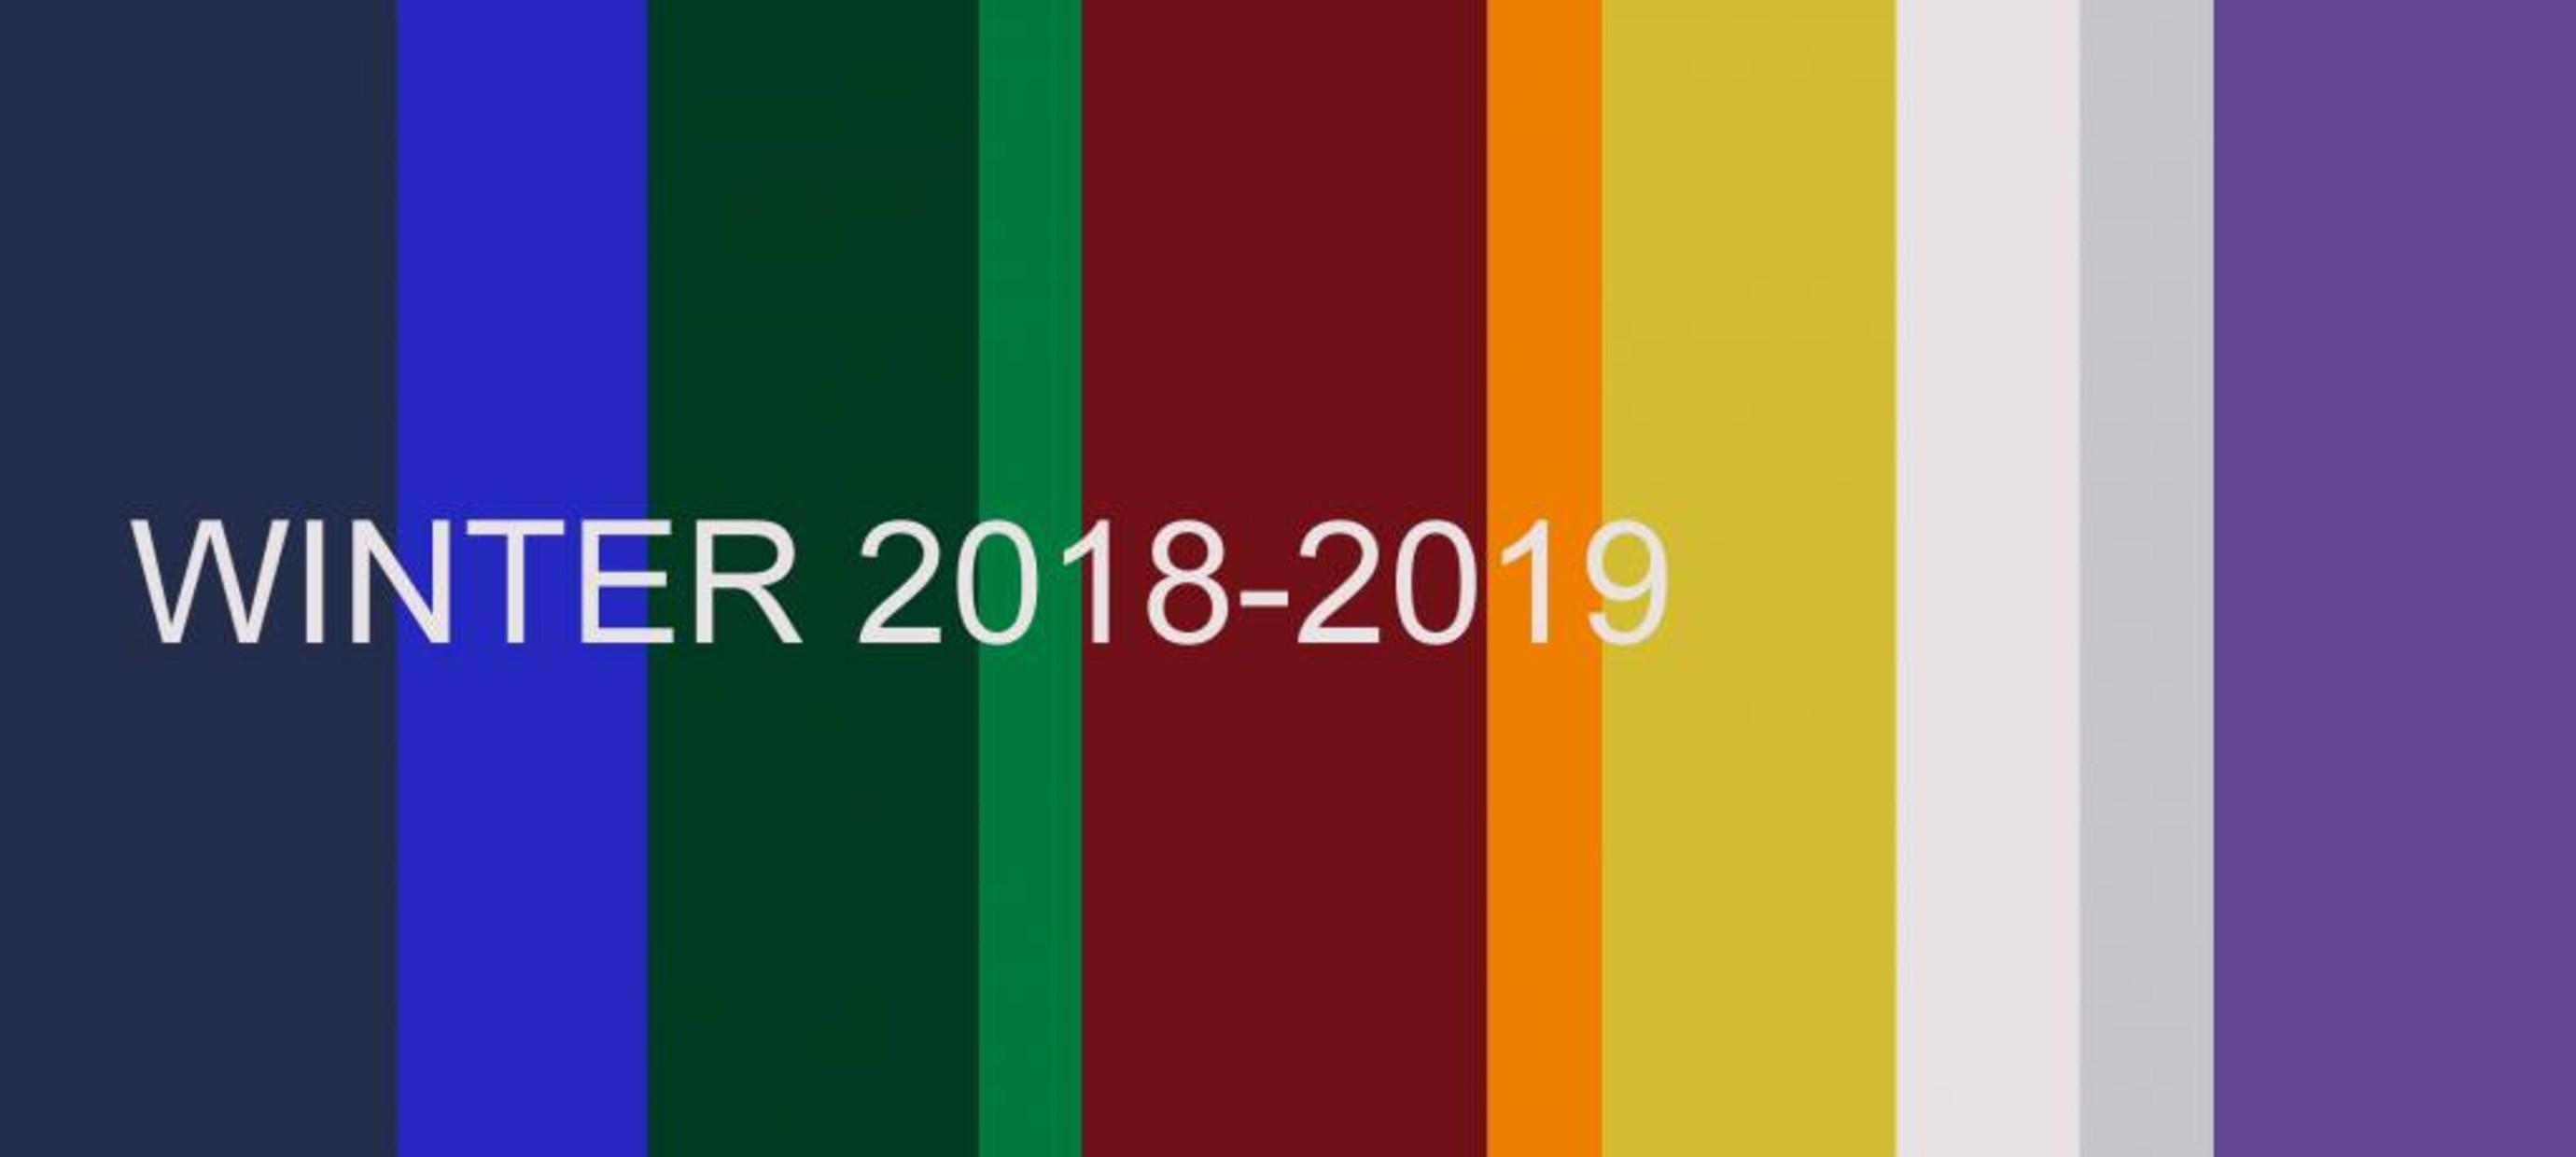 Top 10 fashion colours winter 2018-2019